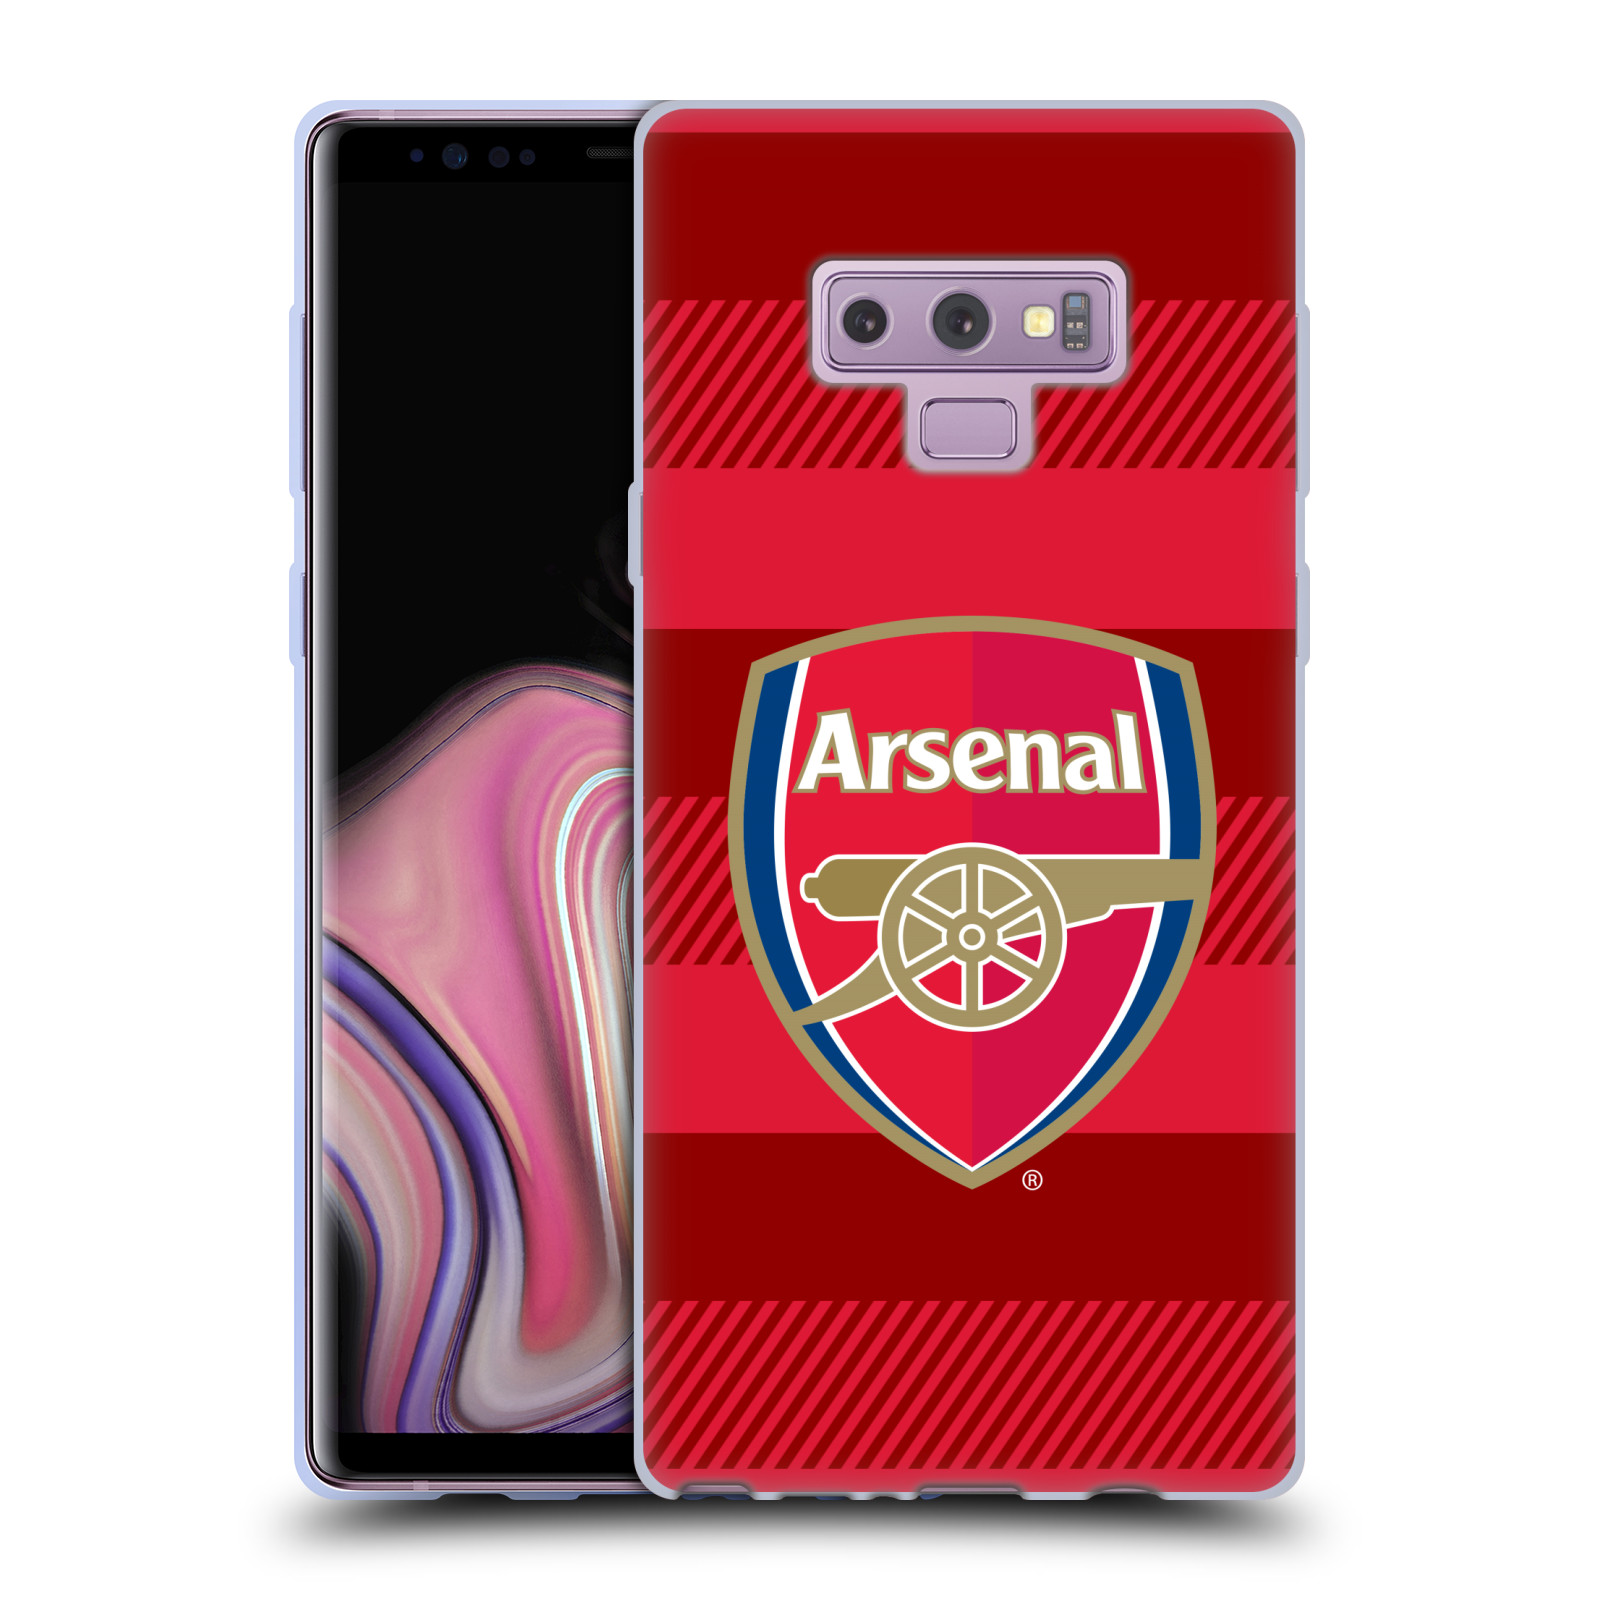 Silikonové pouzdro na mobil Samsung Galaxy Note 9 - Head Case - Arsenal FC - Logo s pruhy